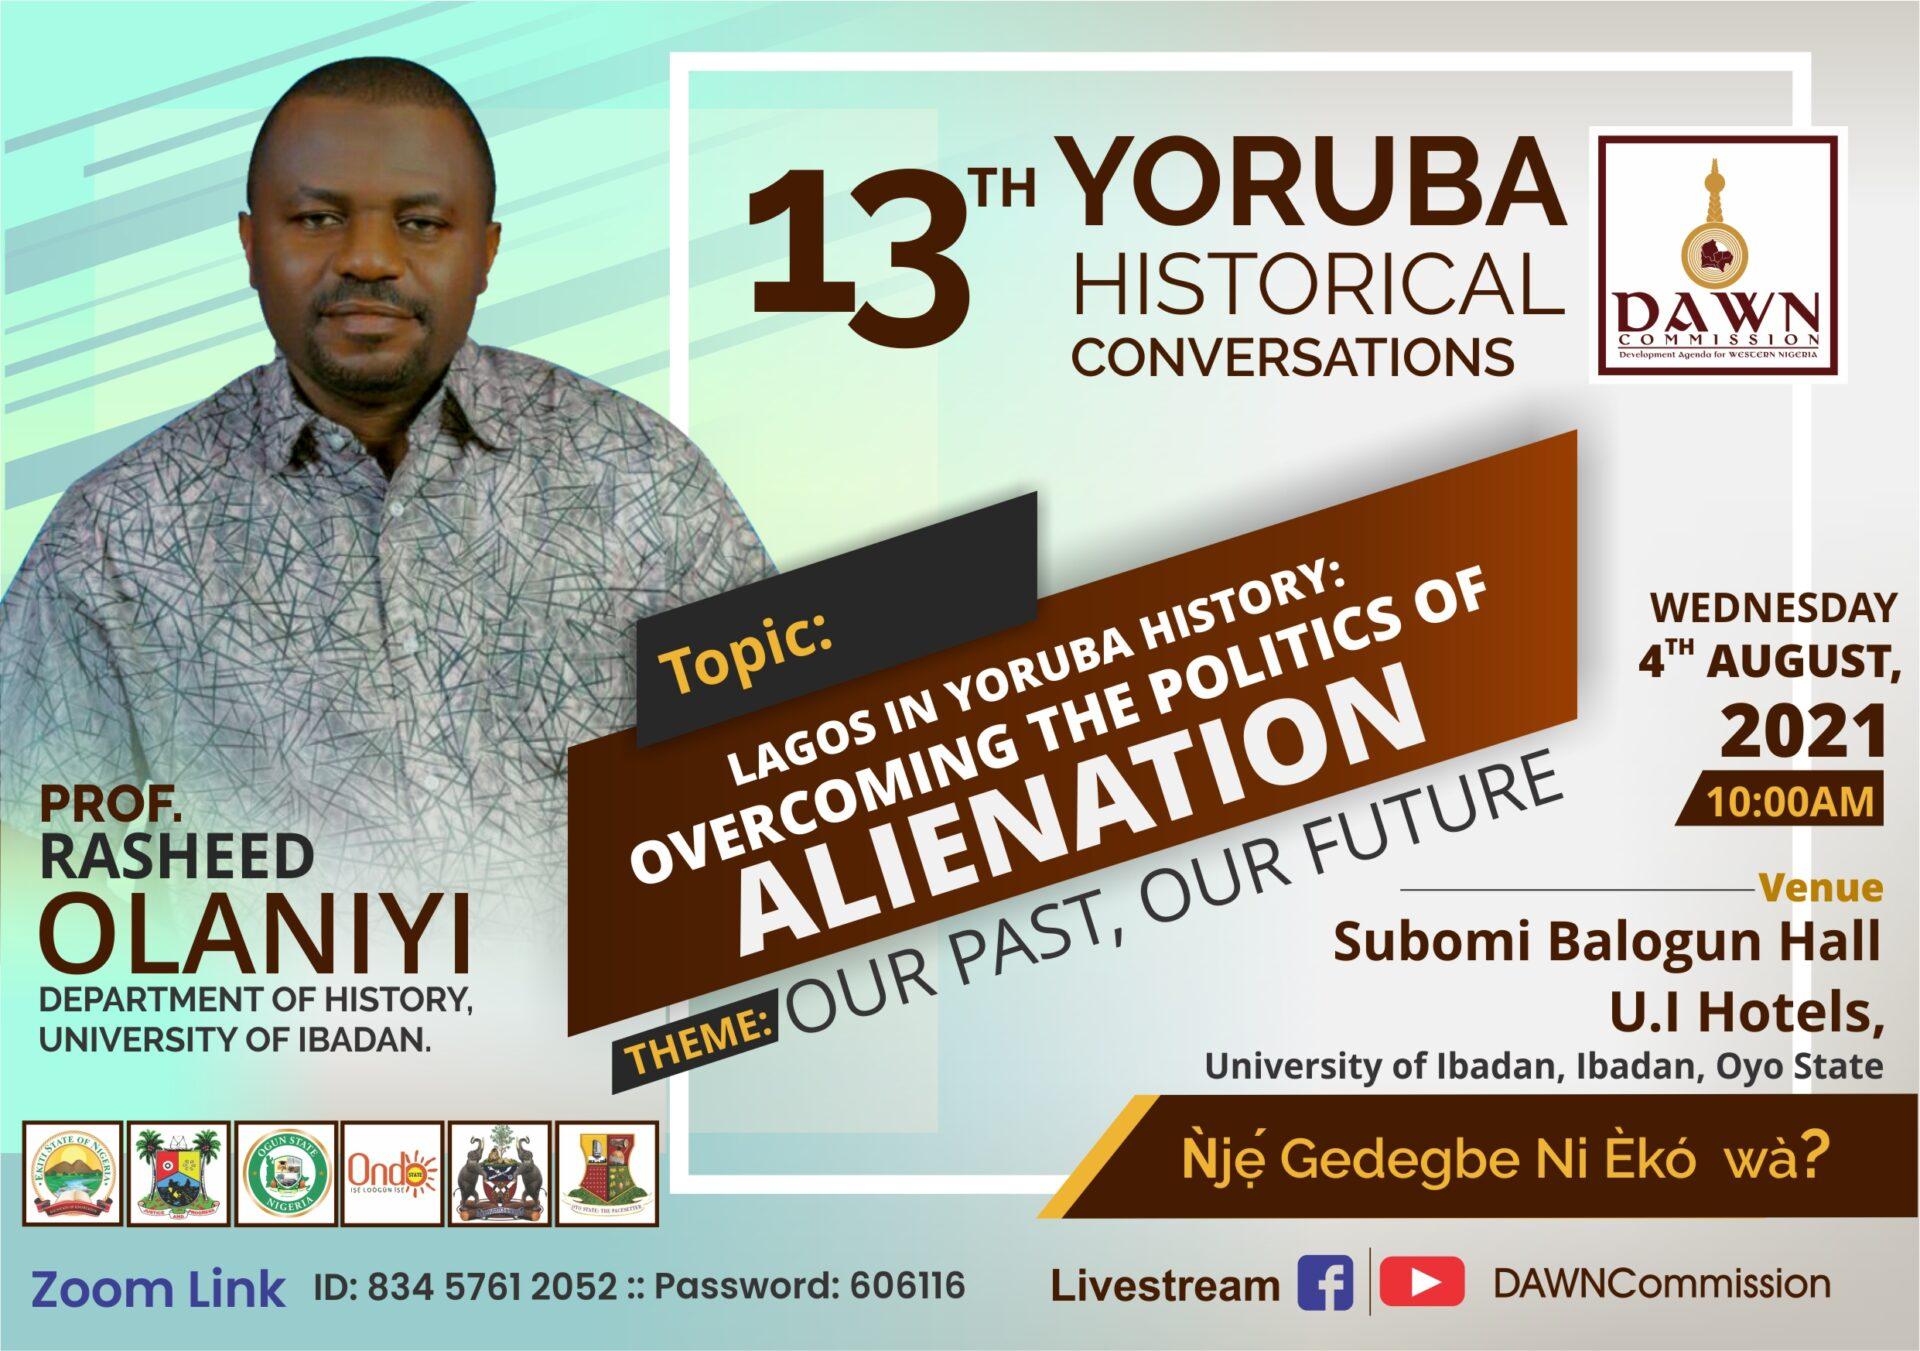 yoruba historical conversation 13th Edition (10am)